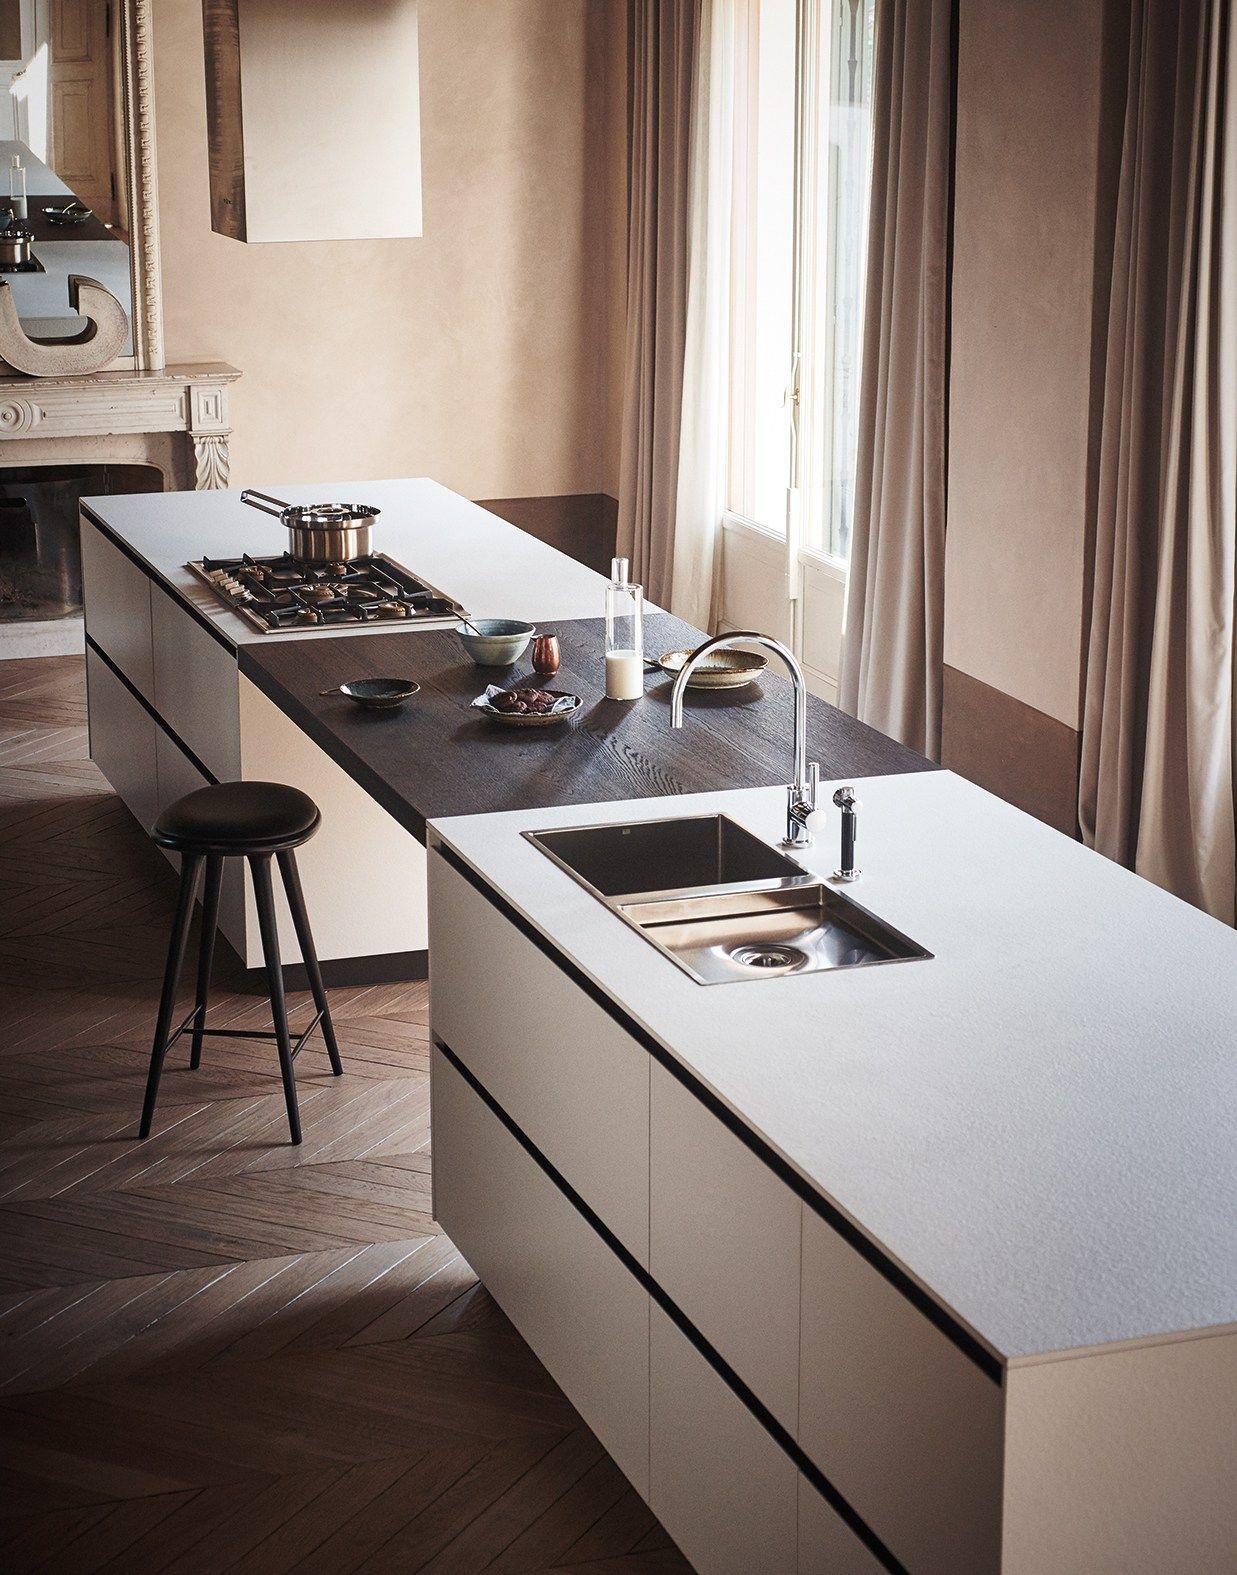 Cocina integral con isla de gres abujardado blanco maxima for Arredamenti case bellissime